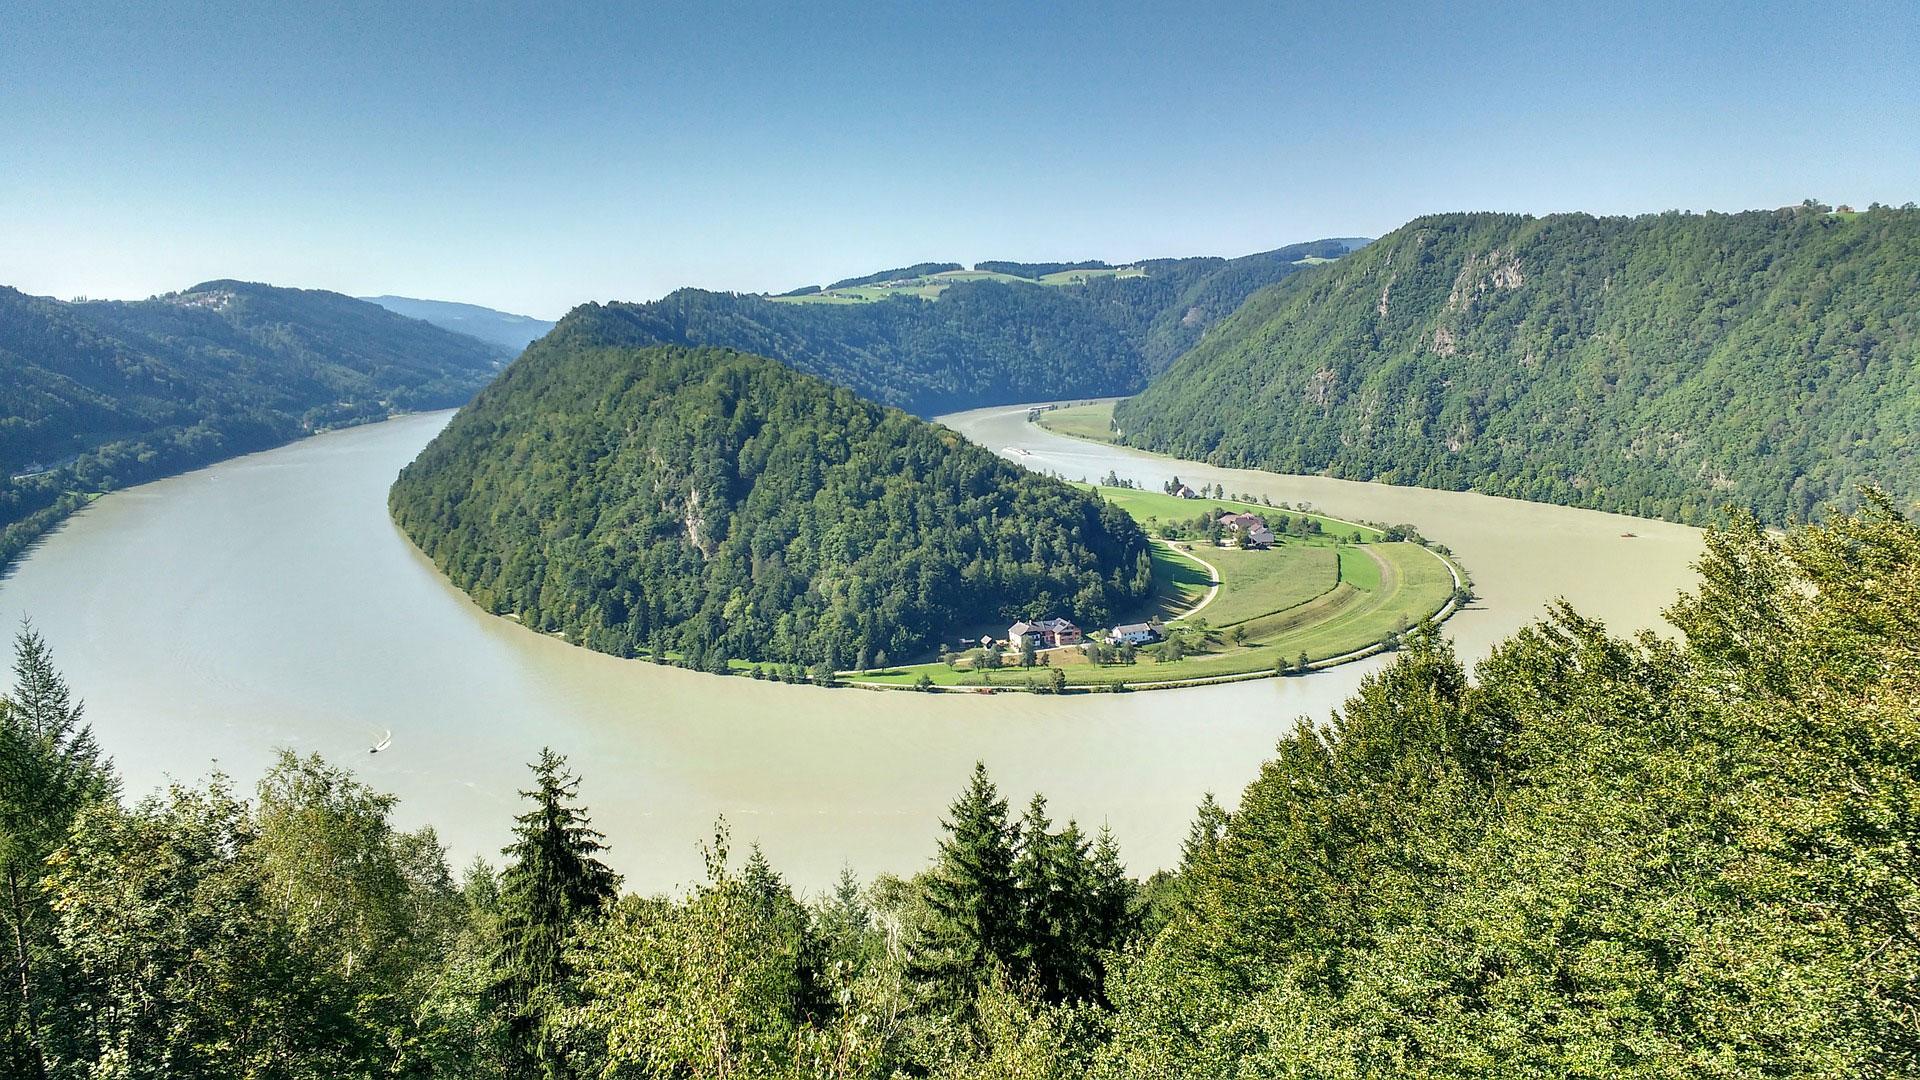 De Donau-lus Schlögen